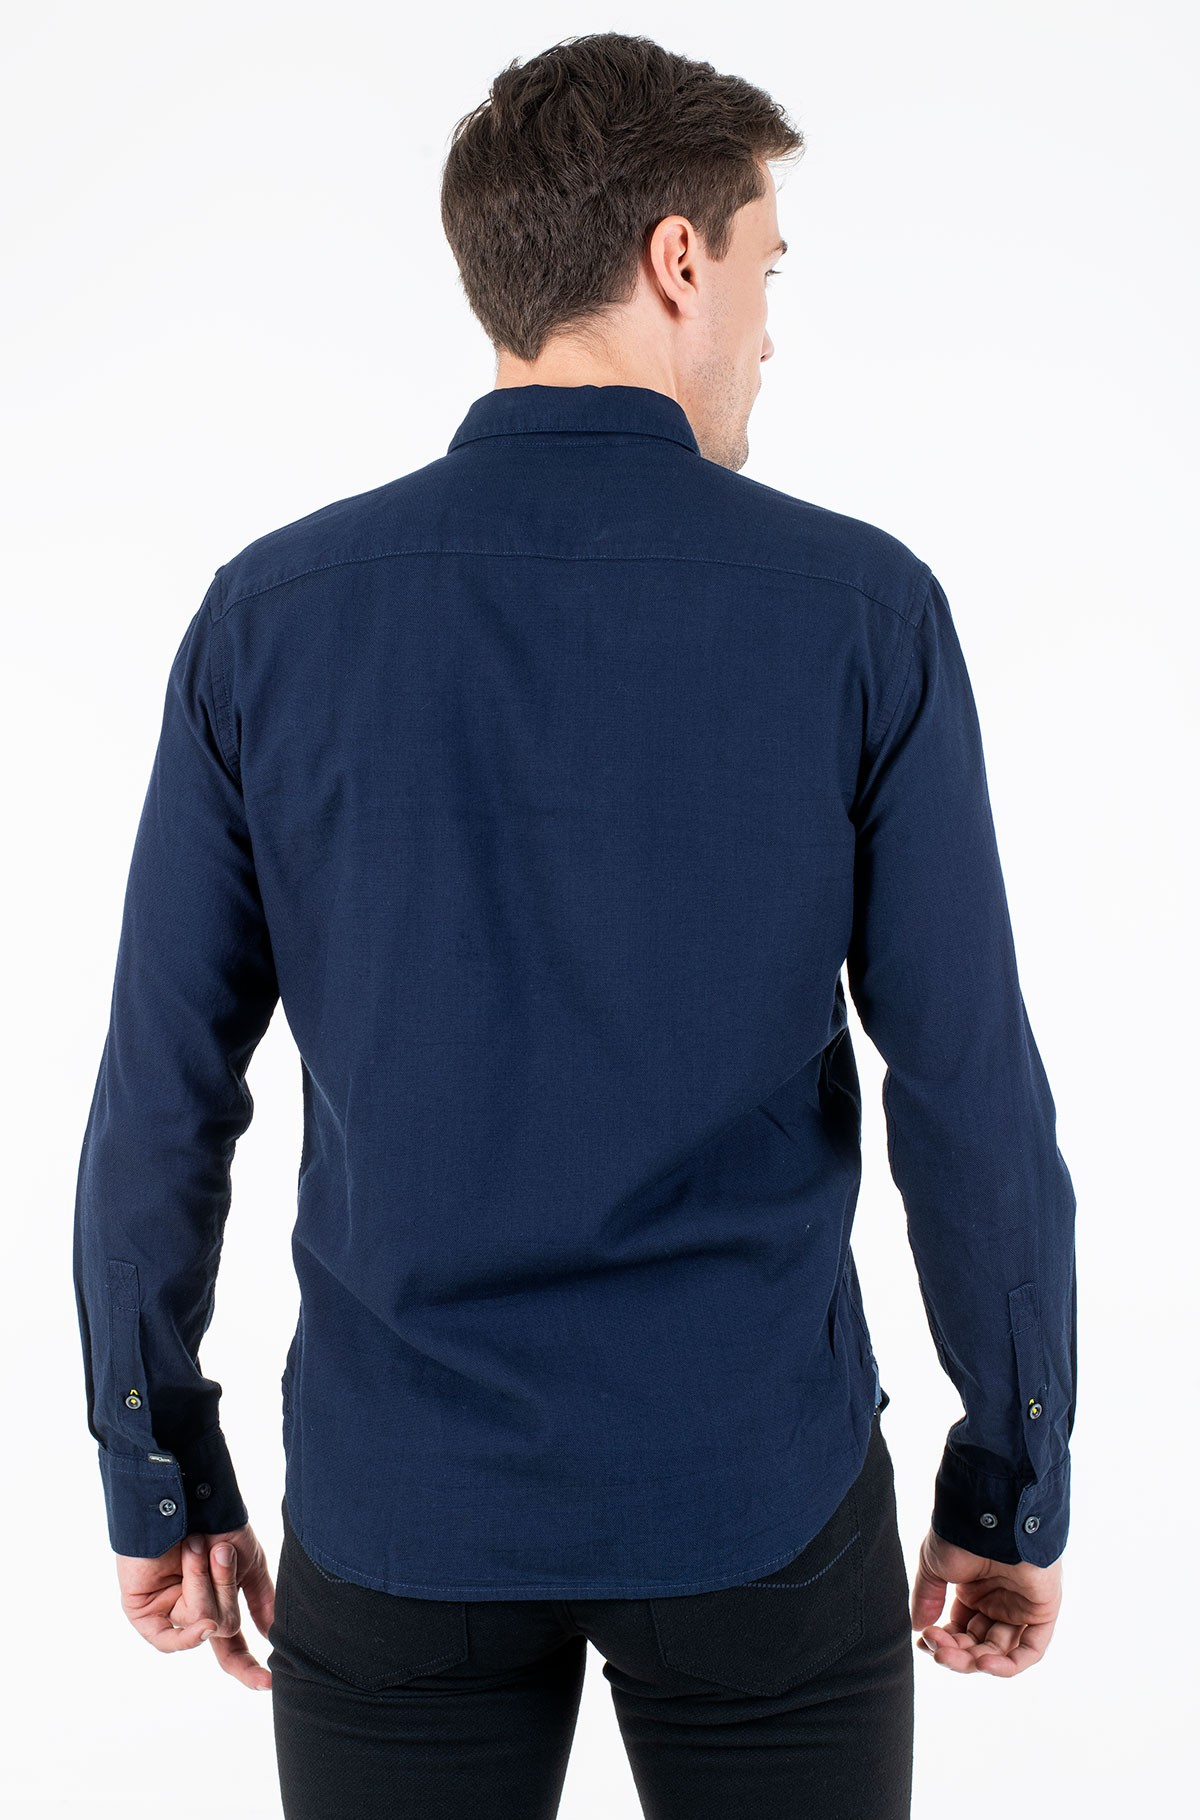 Marškiniai 409101/4S01-full-2